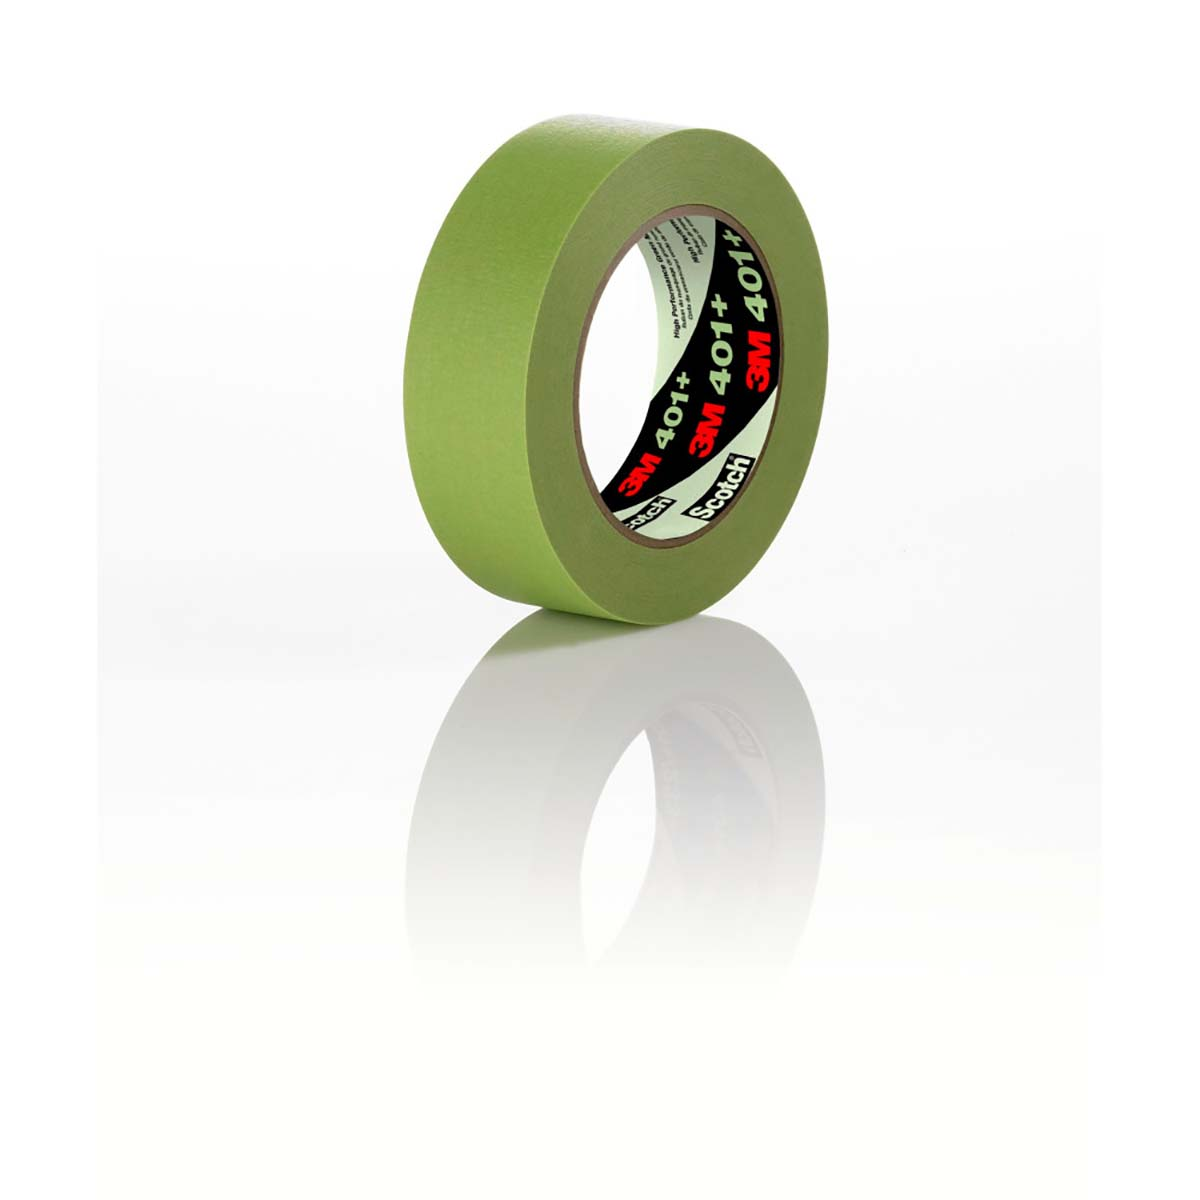 3M High Performance Green Masking Tape 401+, 24 mm x 55 m 6.7 mil, 24 per case Bulk